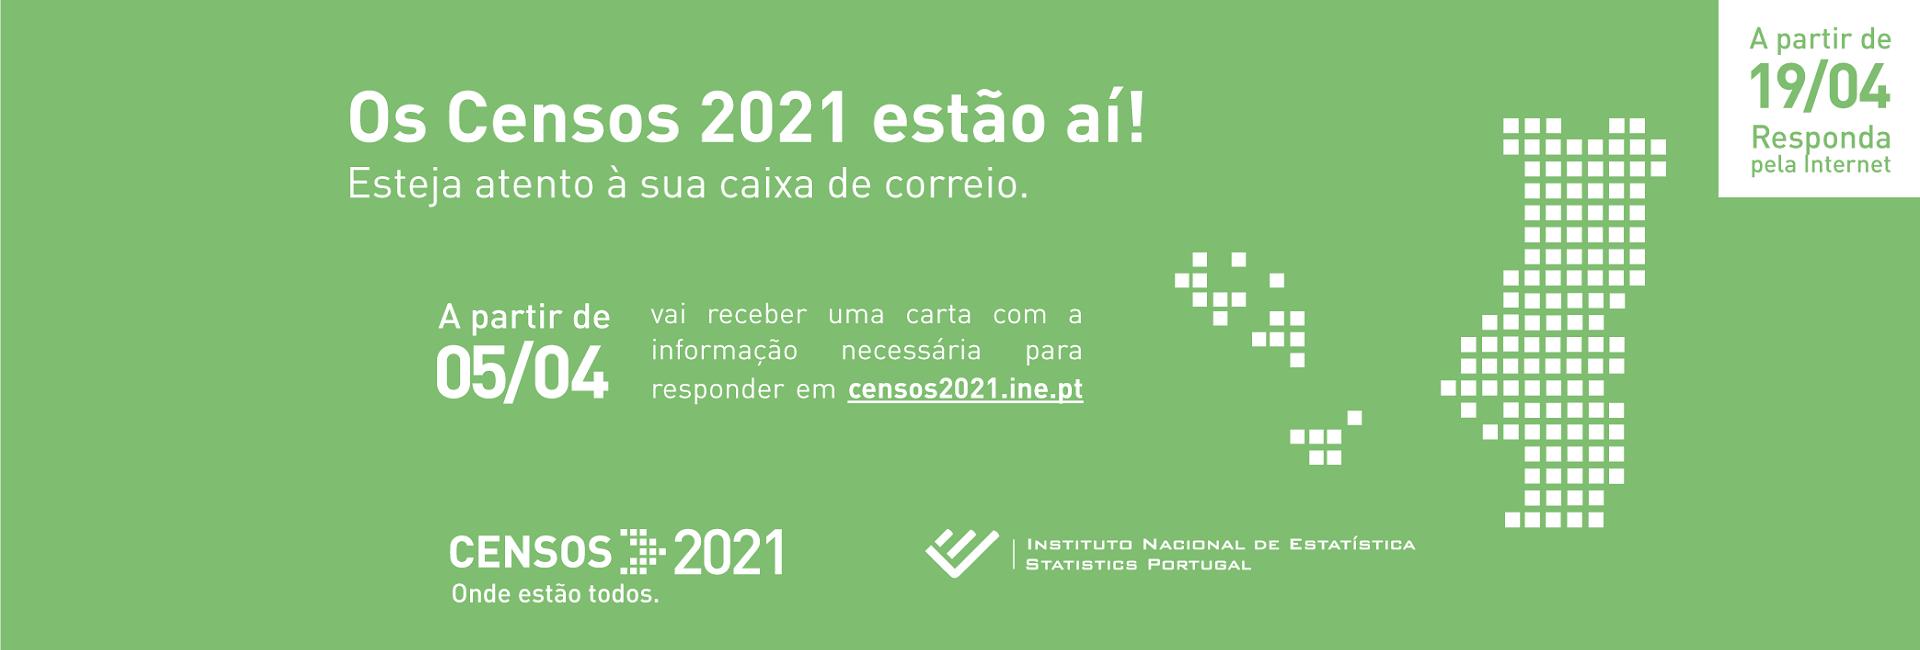 censos 2021_2021